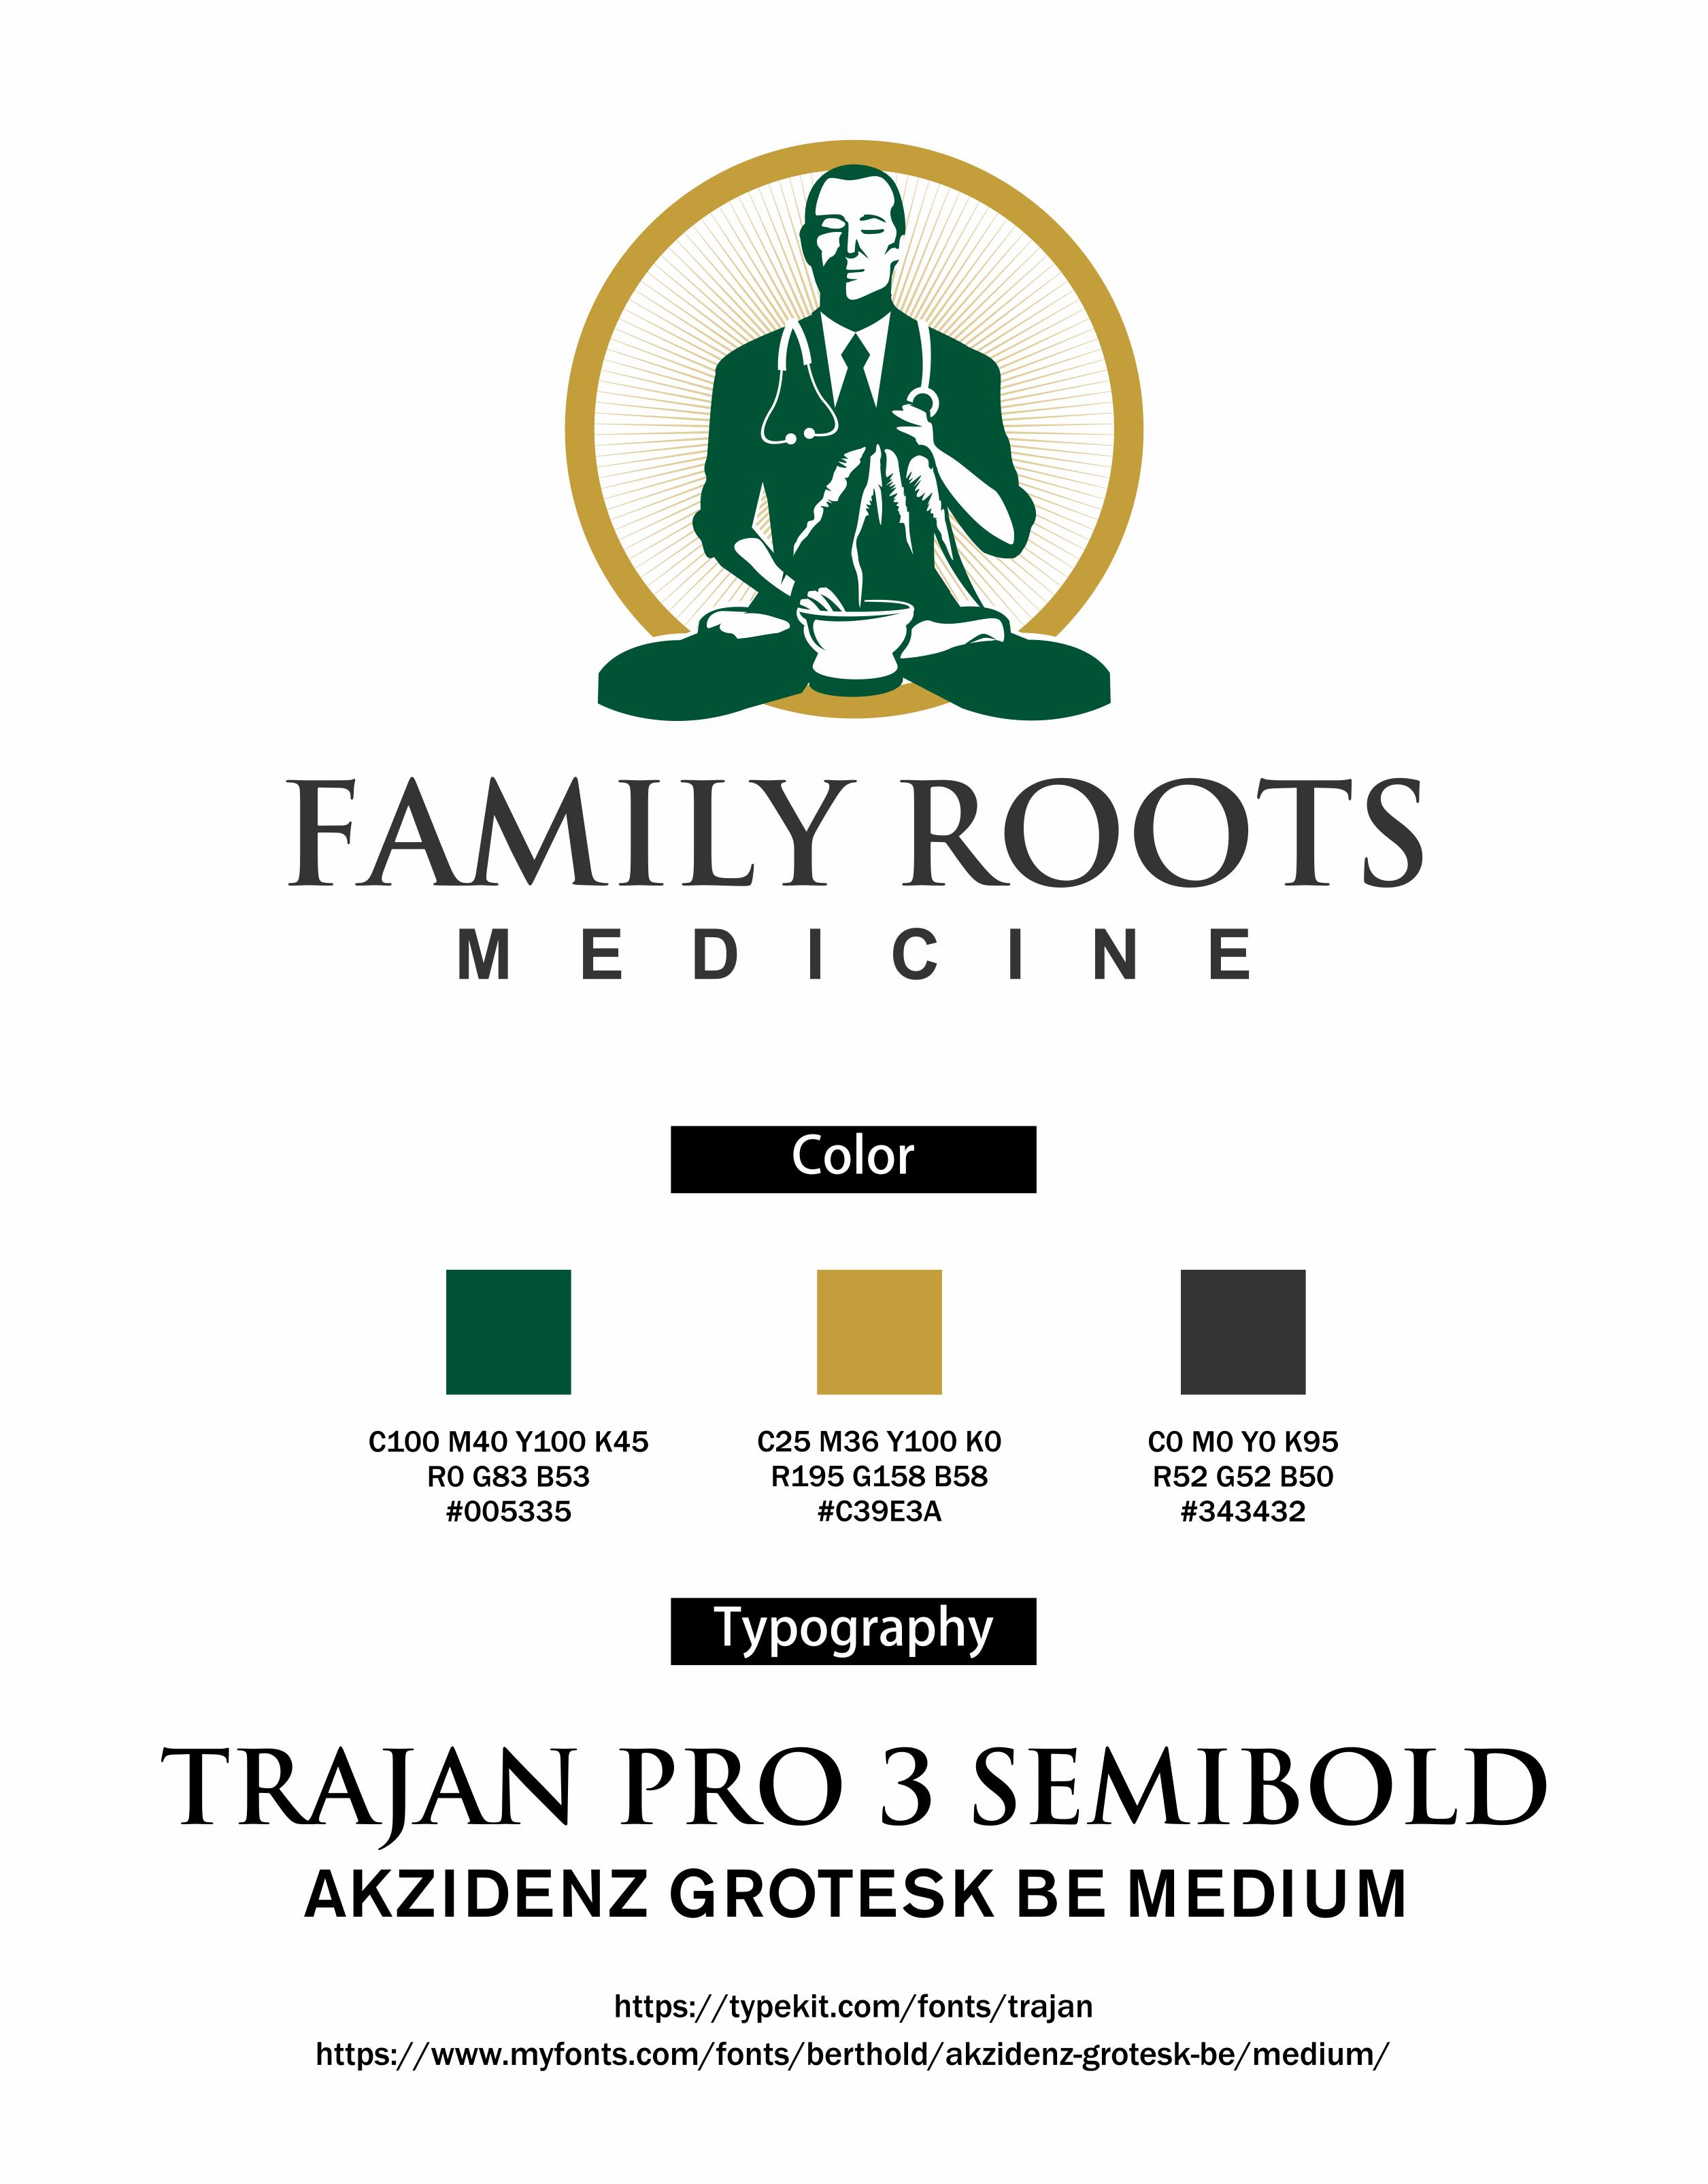 Create an image for your friendly neighborhood Yoga medicine clinic.